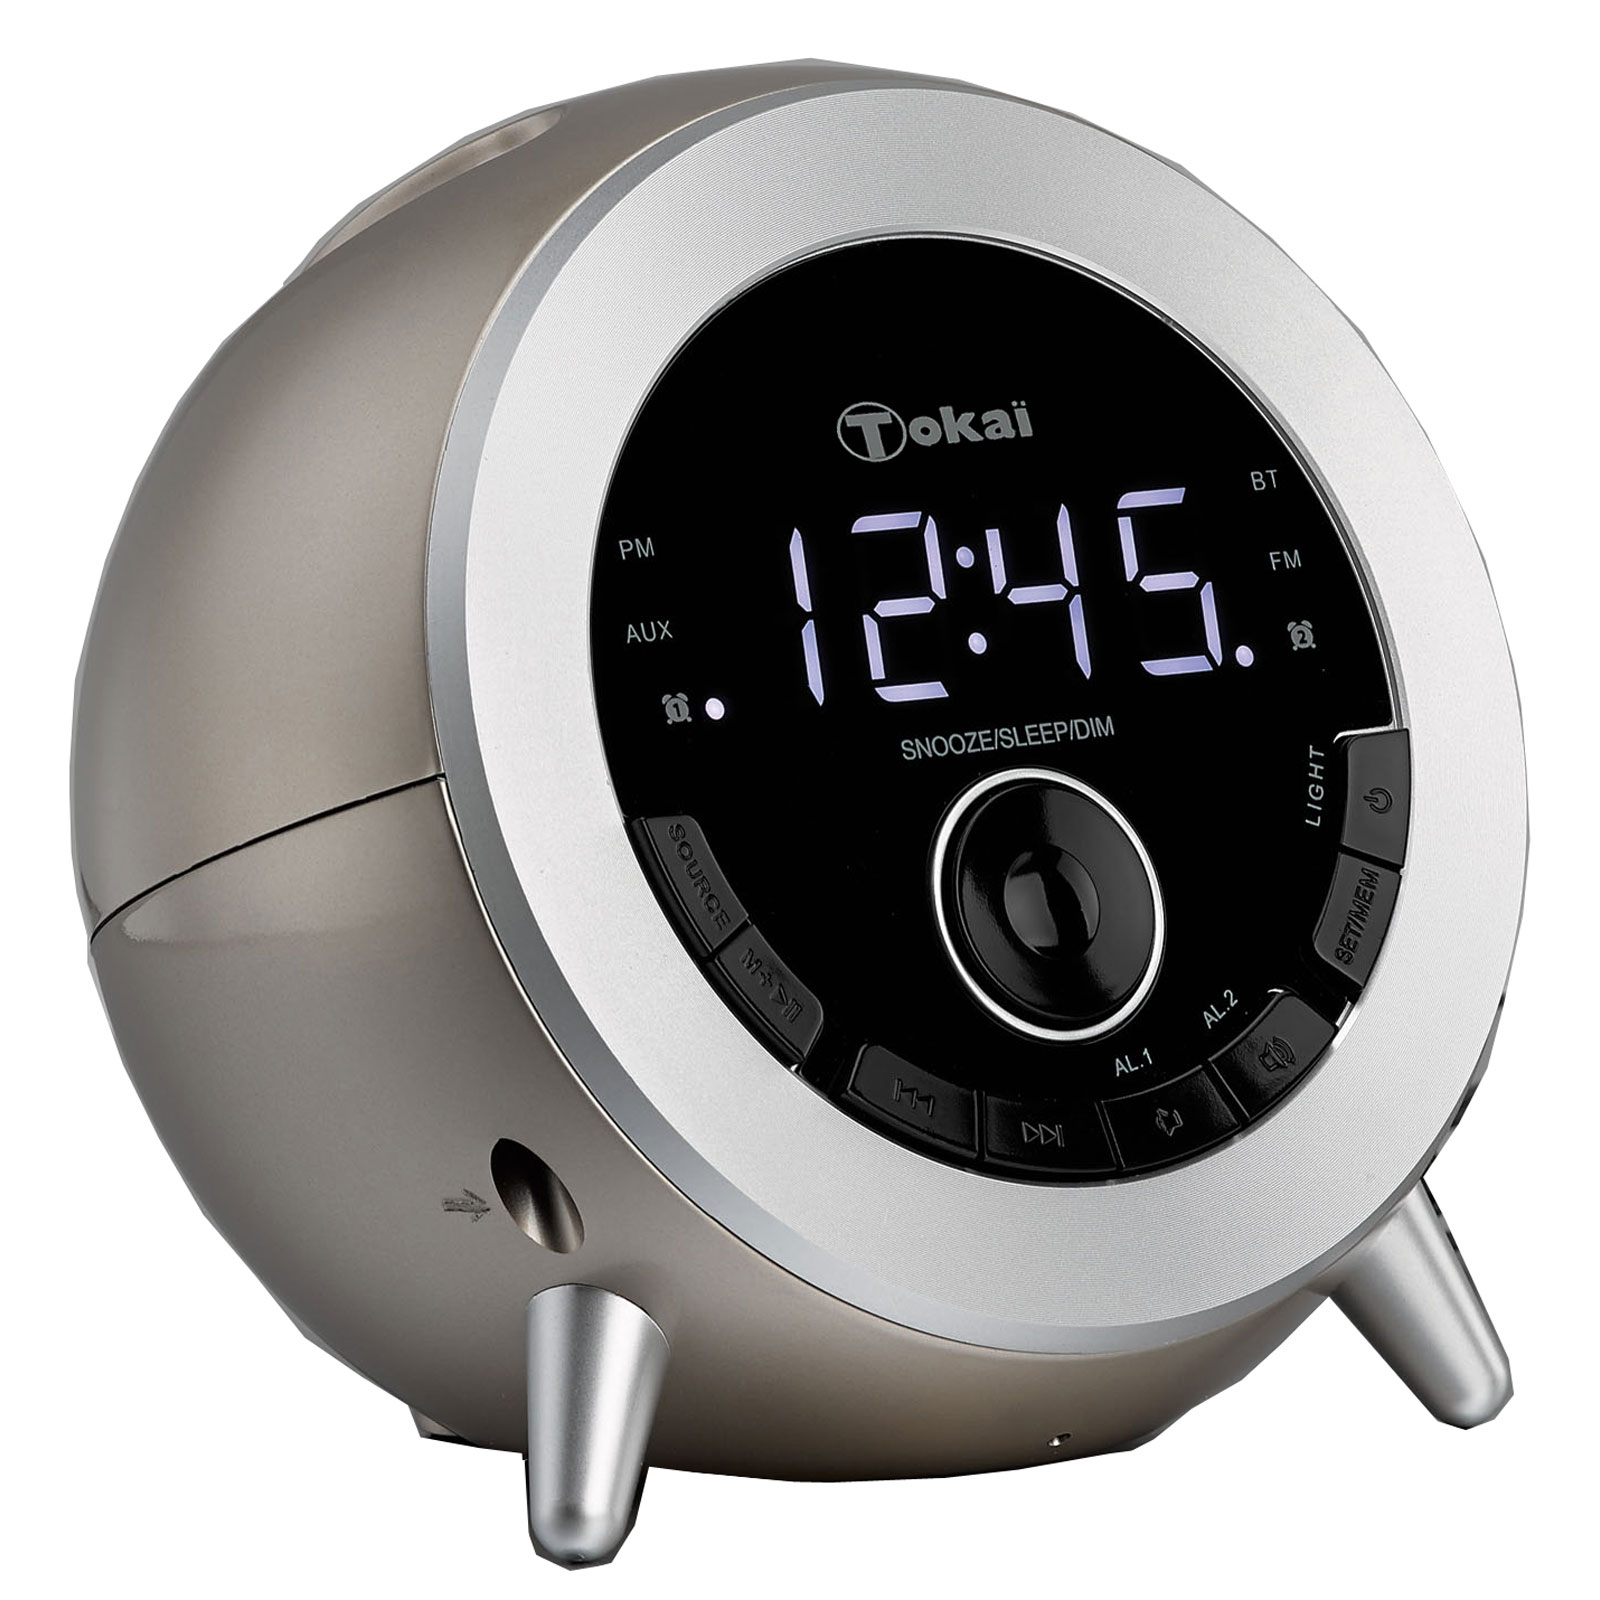 tokai tc 139c gris radio radio r veil toka sur ldlc. Black Bedroom Furniture Sets. Home Design Ideas